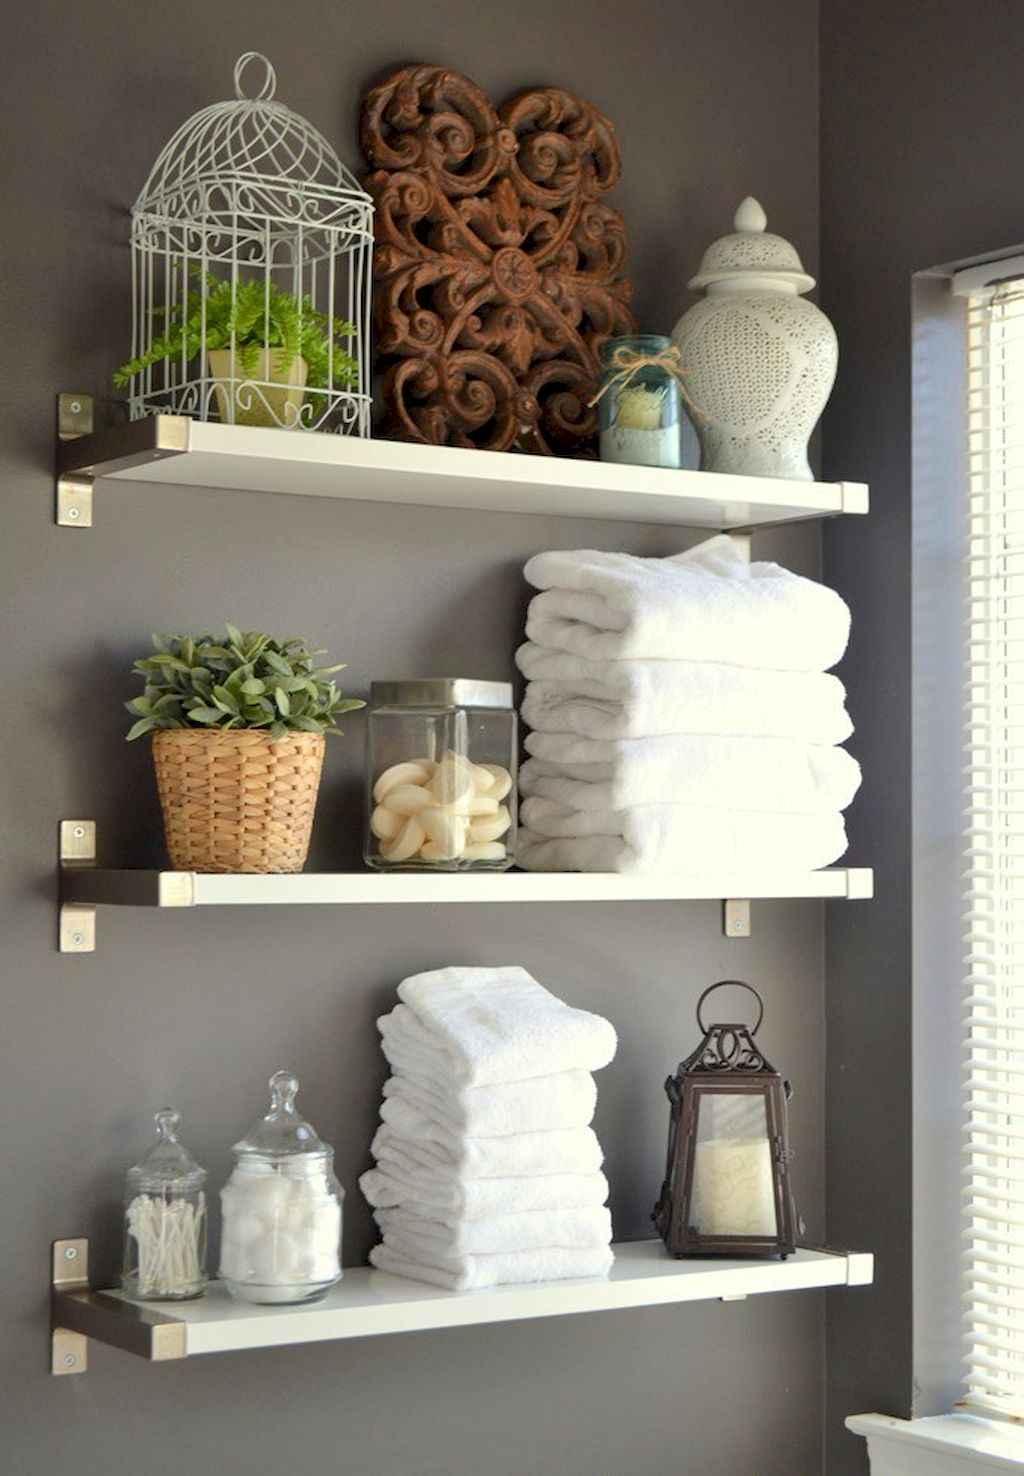 Cool bathroom storage shelves organization ideas (67)